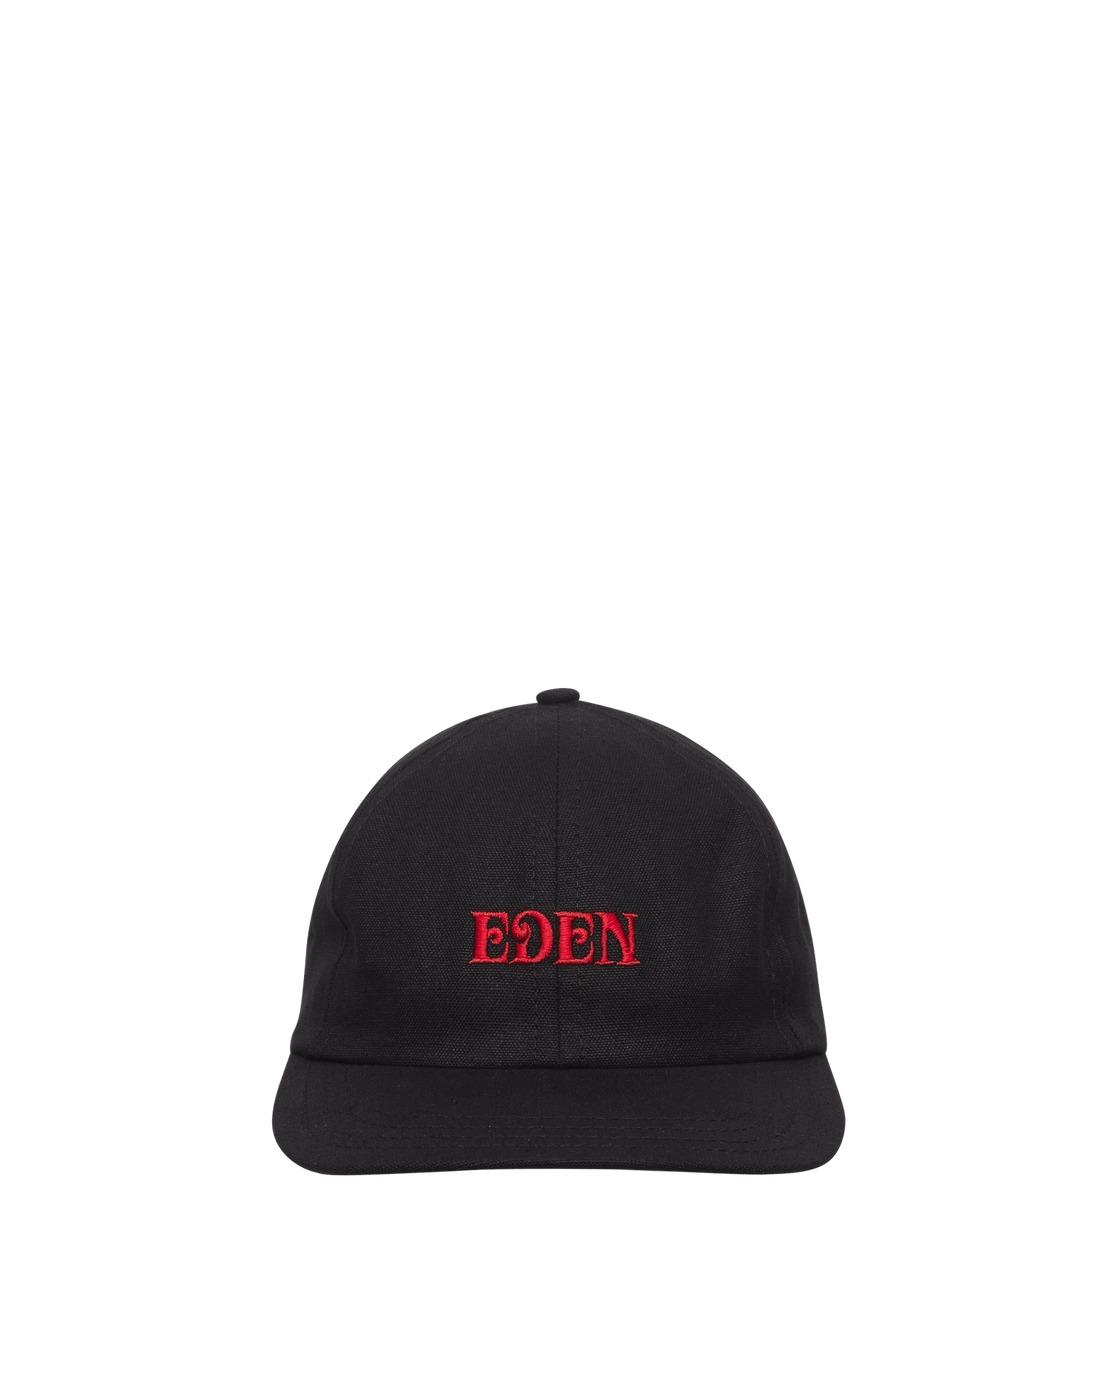 Eden Power Corp Eden Cap Black